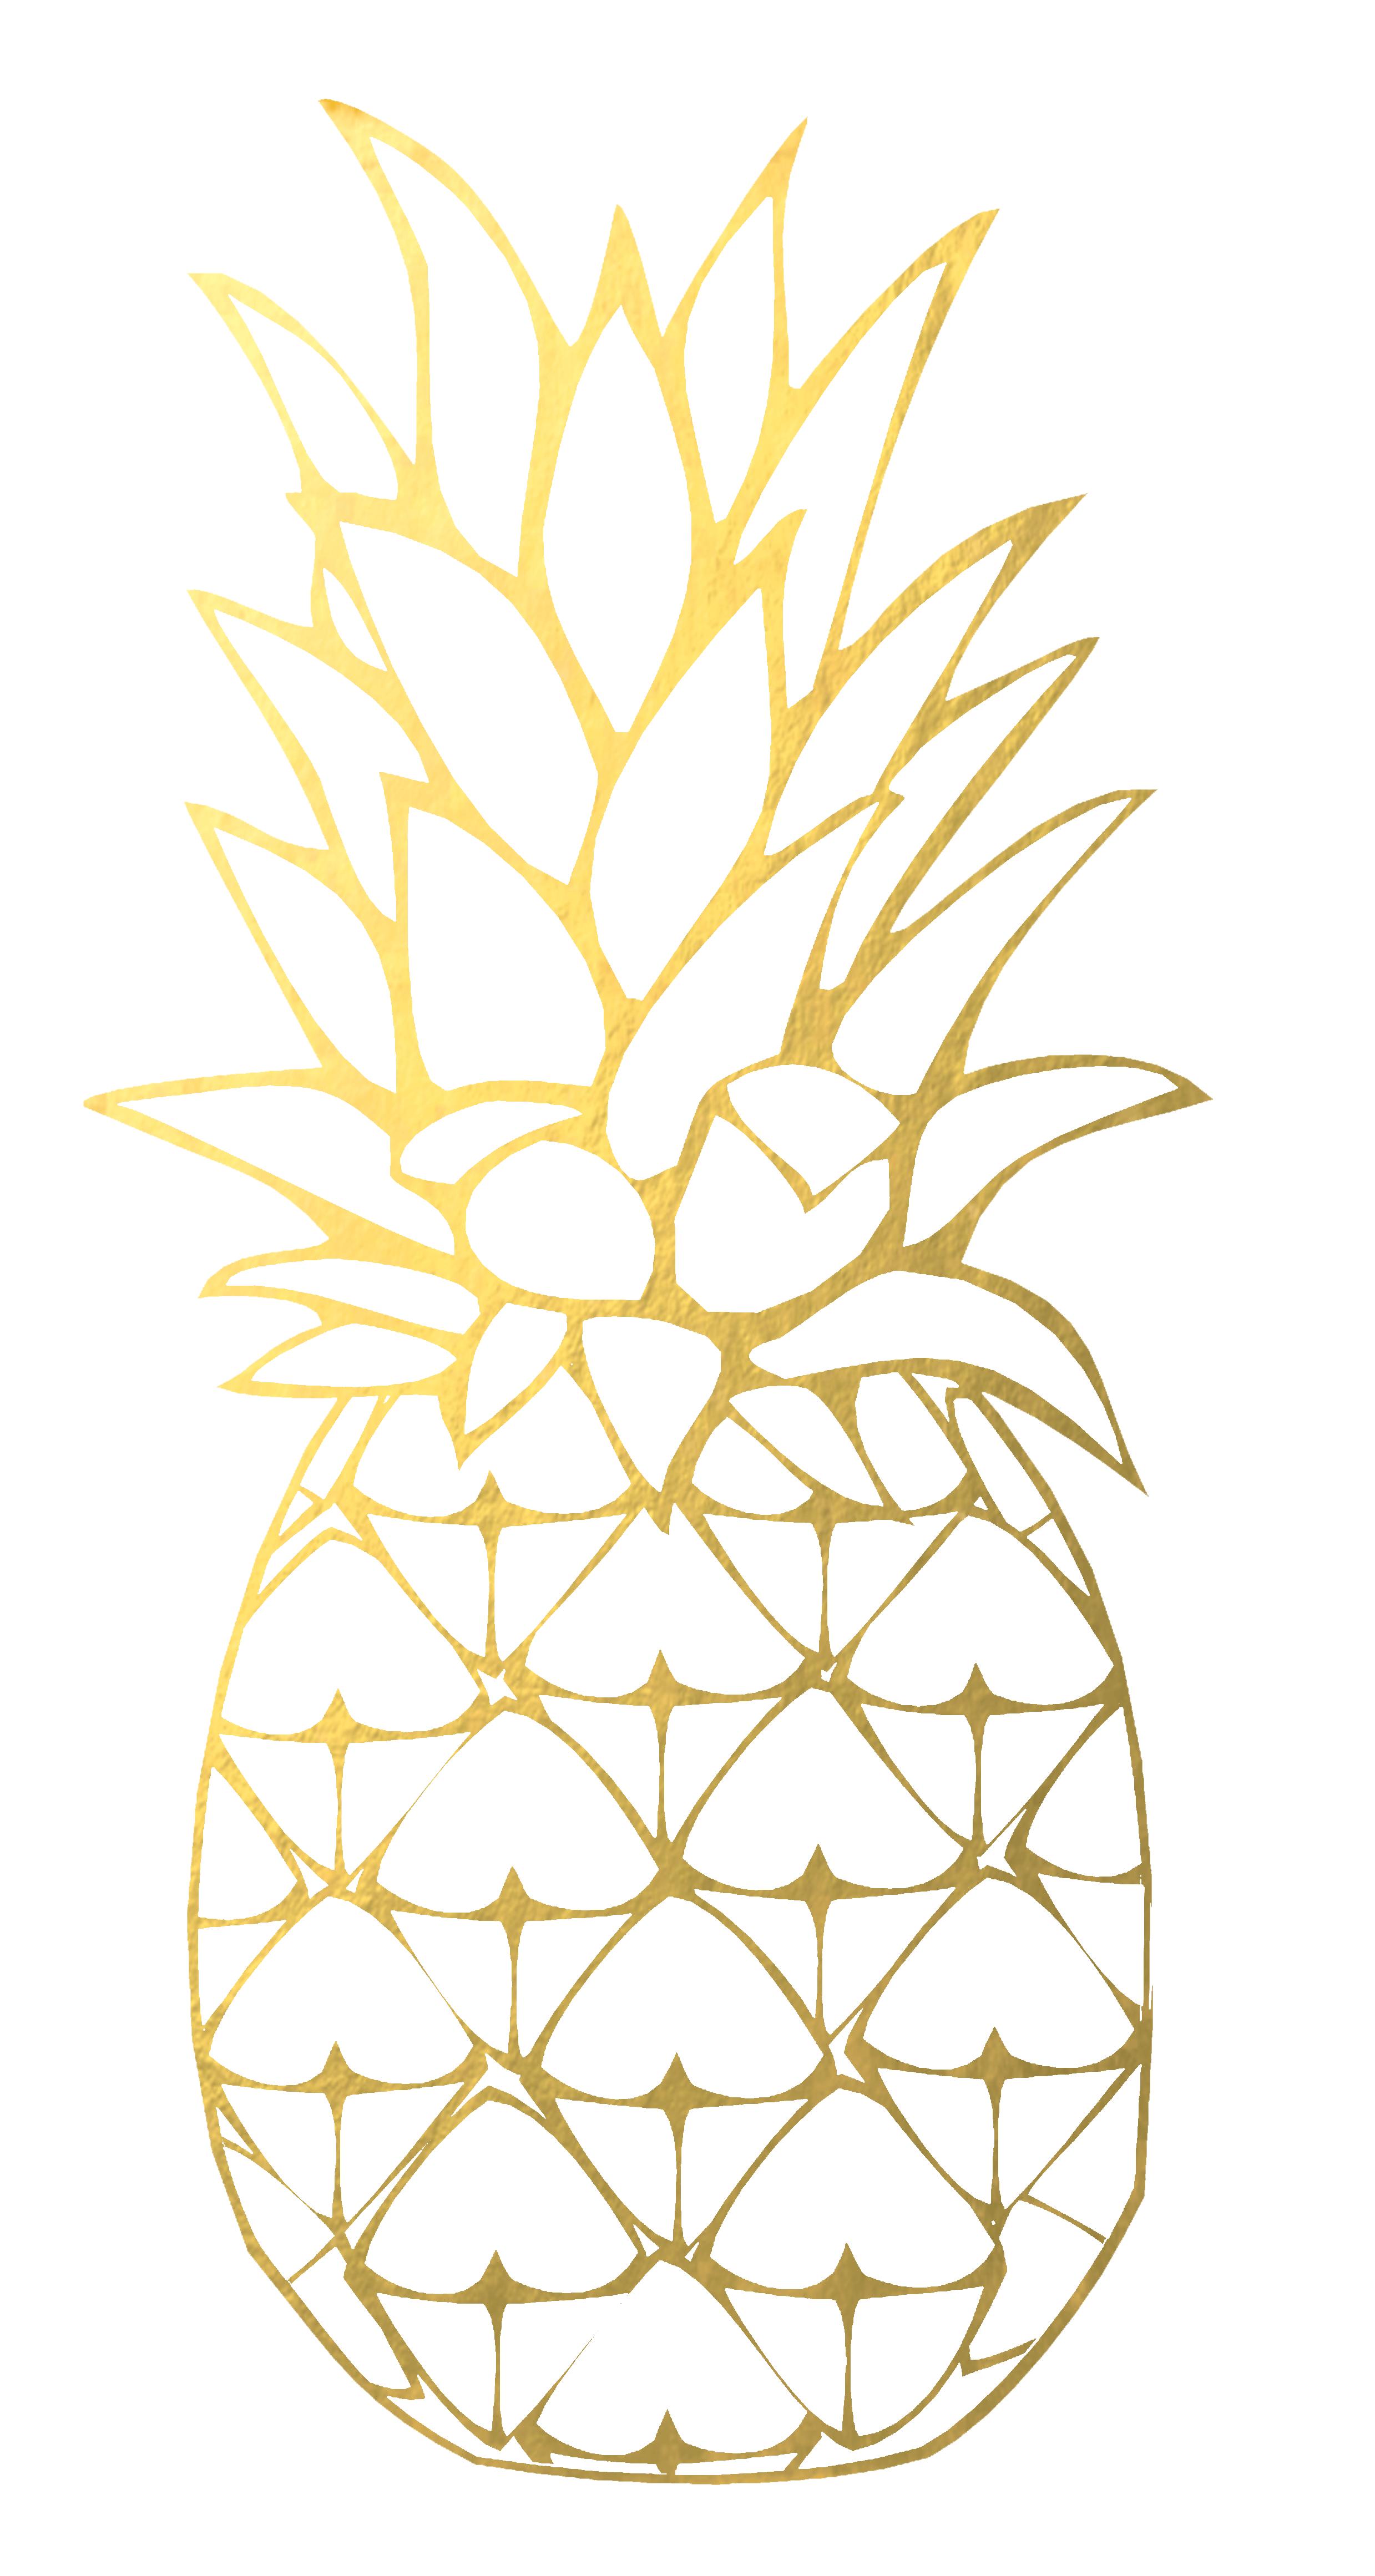 Kawaii designs hawaii cupcake. Clipart pineapple gold pineapple